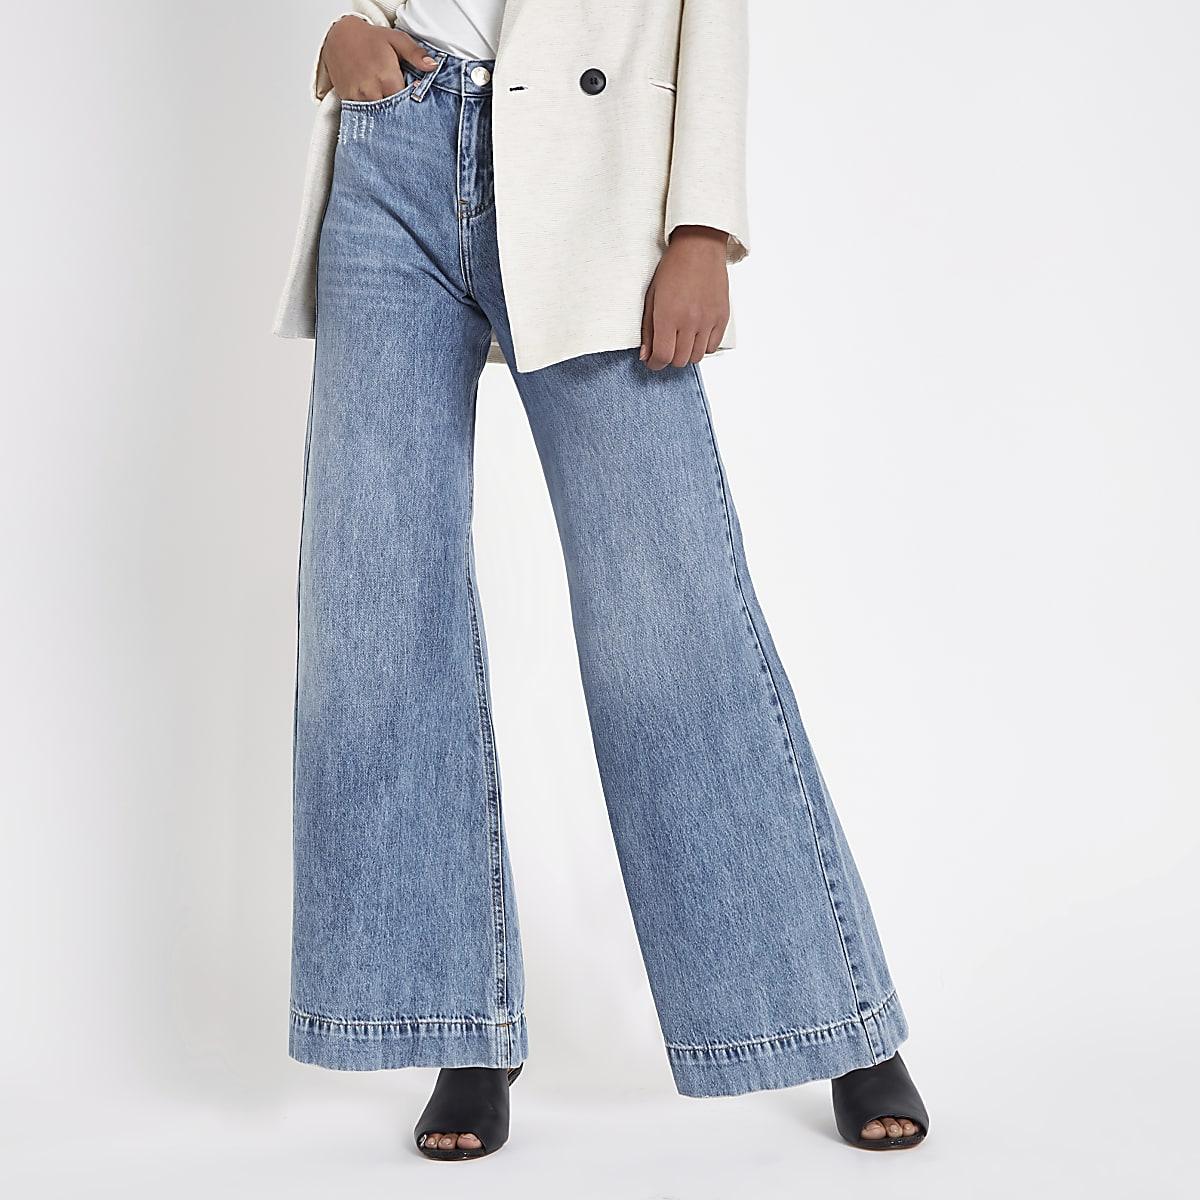 1a773bbbe6 Mid blue wash Mila wide leg jeans - Bootcut & Flared Jeans - Jeans - women